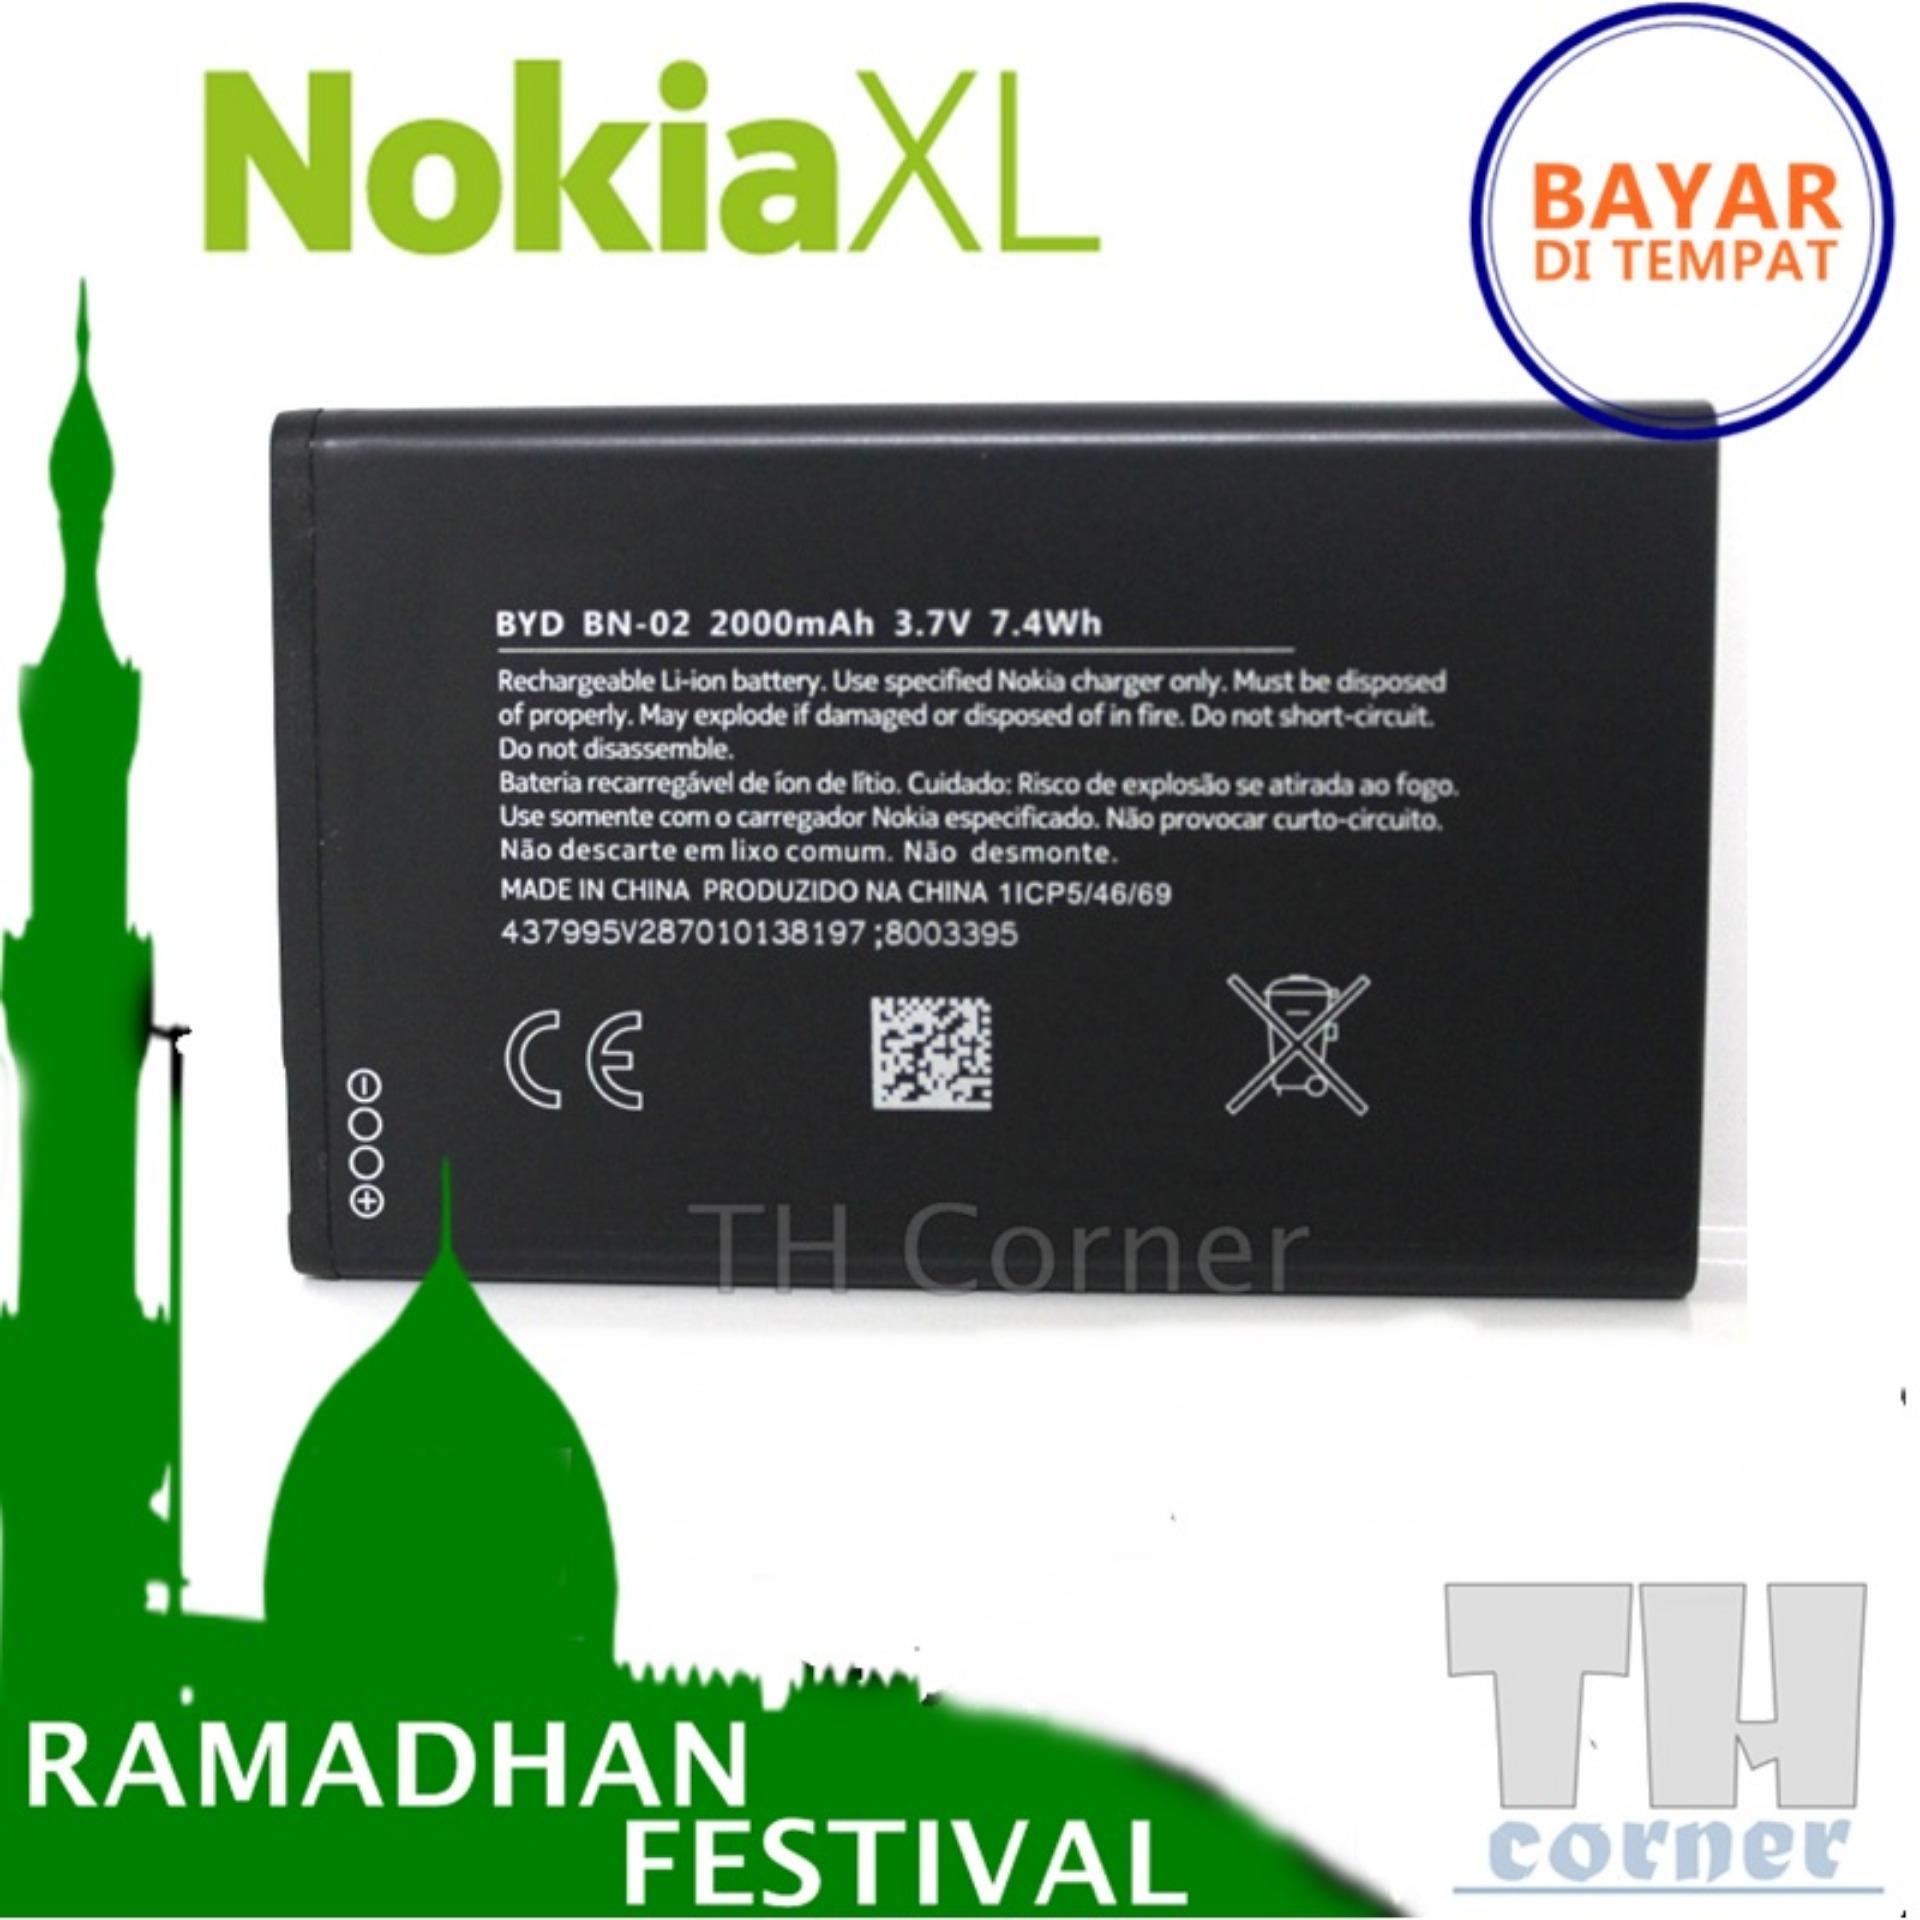 Nokia Battery BN-02 Capacity 2000mAh Baterai for Nokia XL - Original